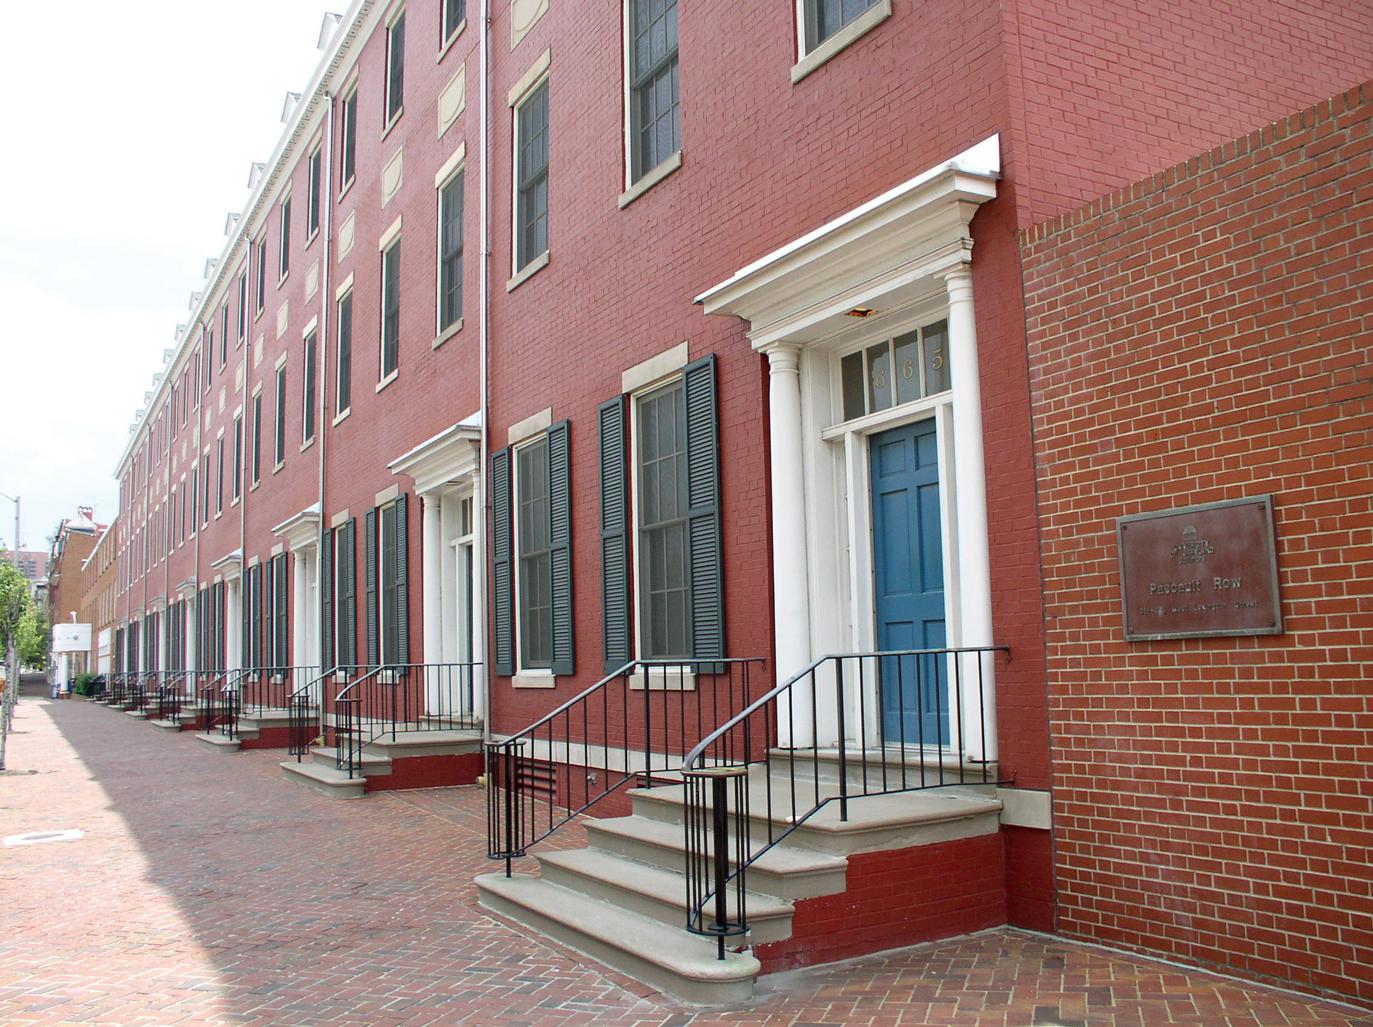 Home university of maryland baltimore - Umb Housing